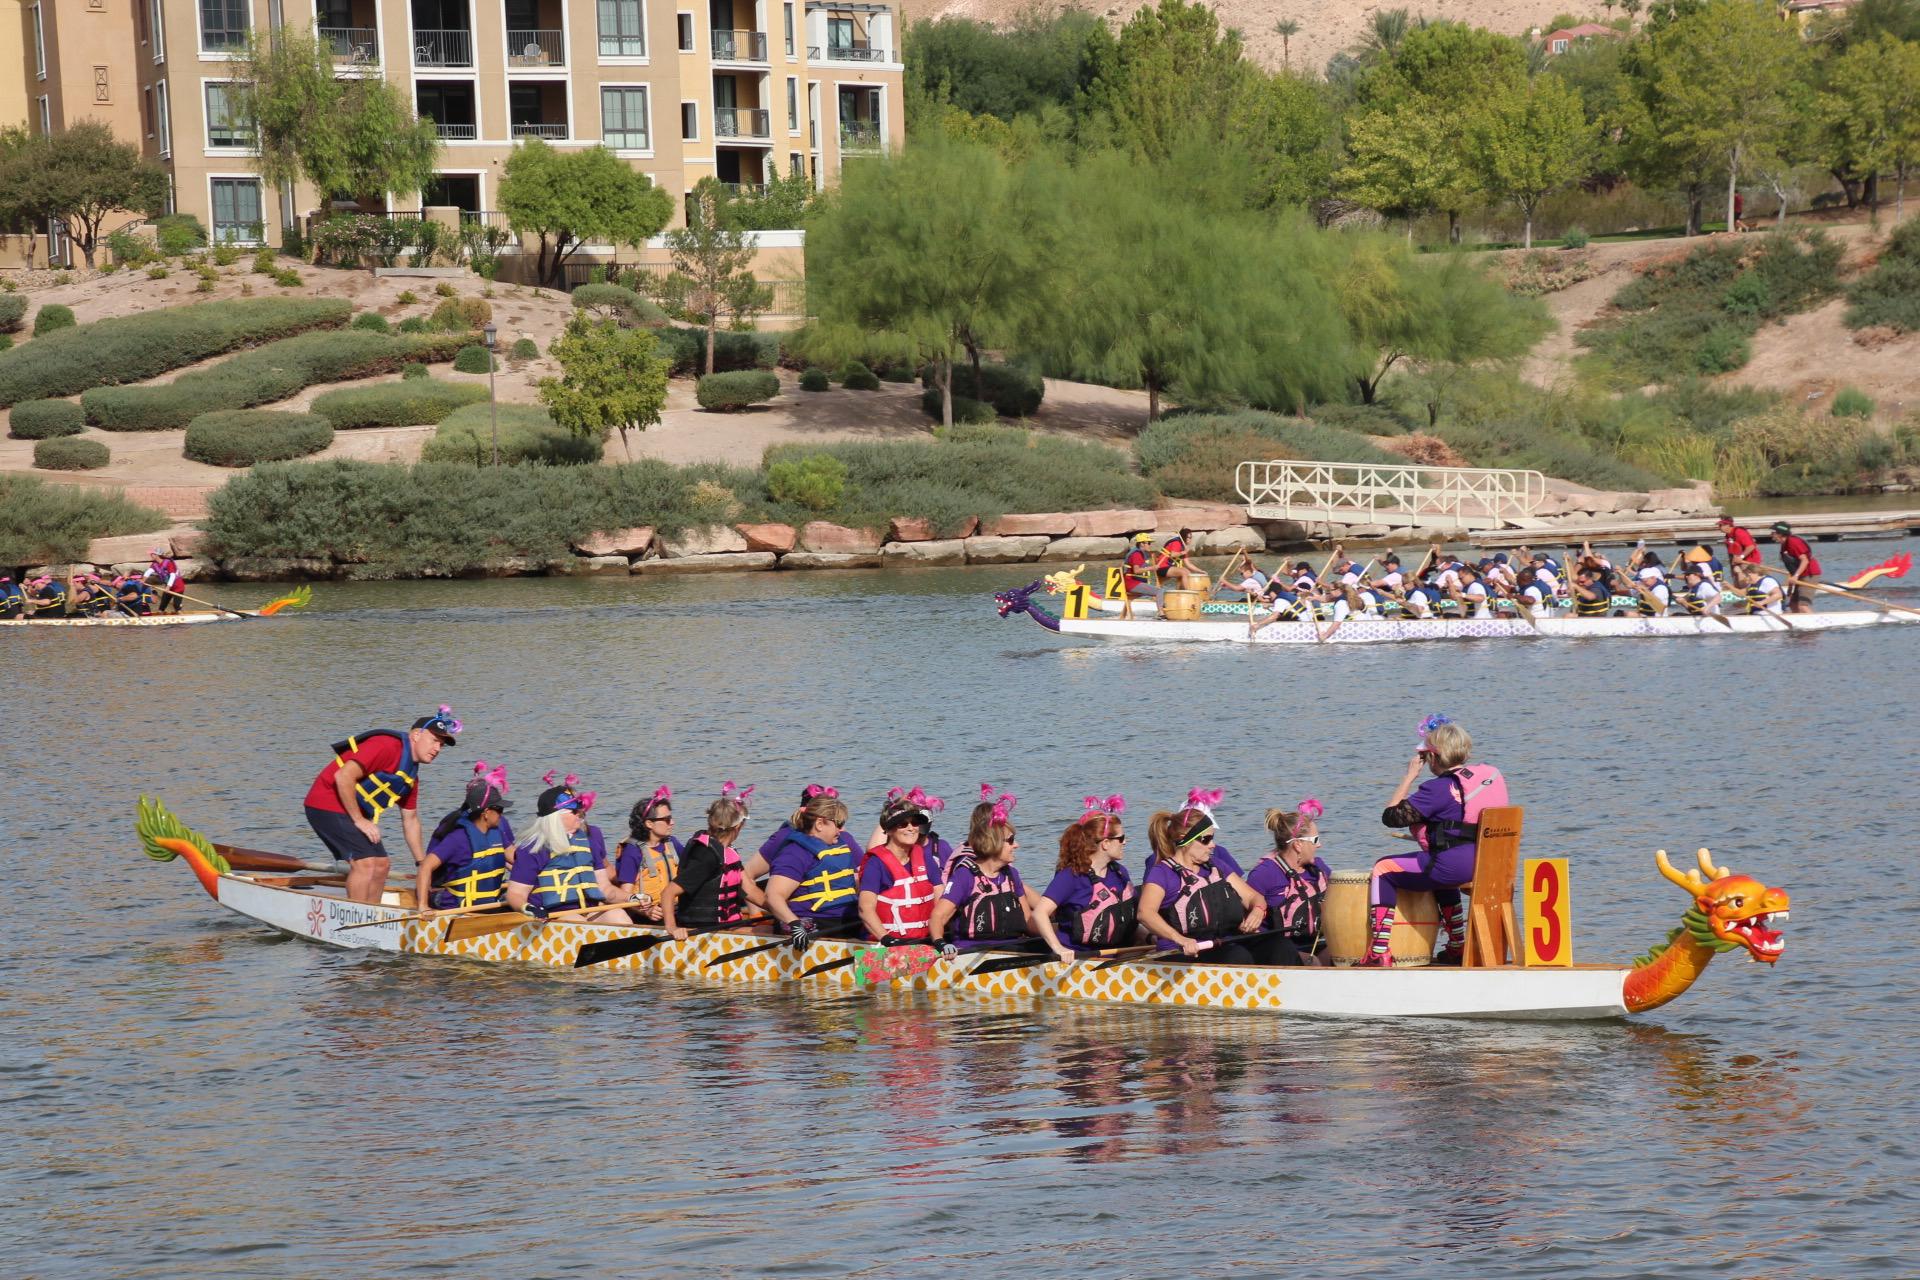 two long dragon boats on the water at Lake Las Vegas